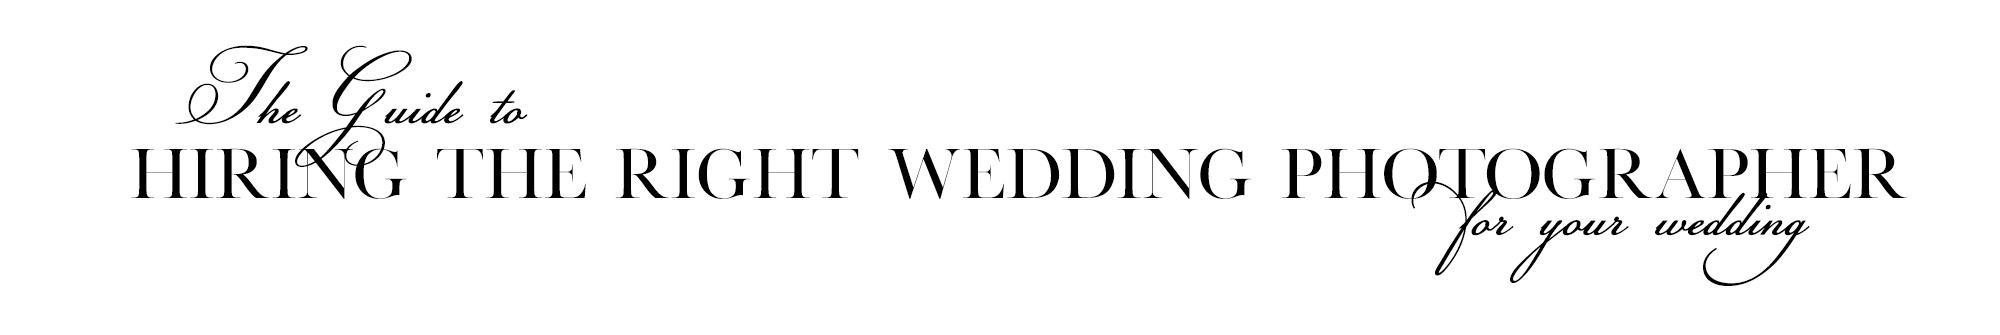 hiring the right wedding photographer header image.jpg